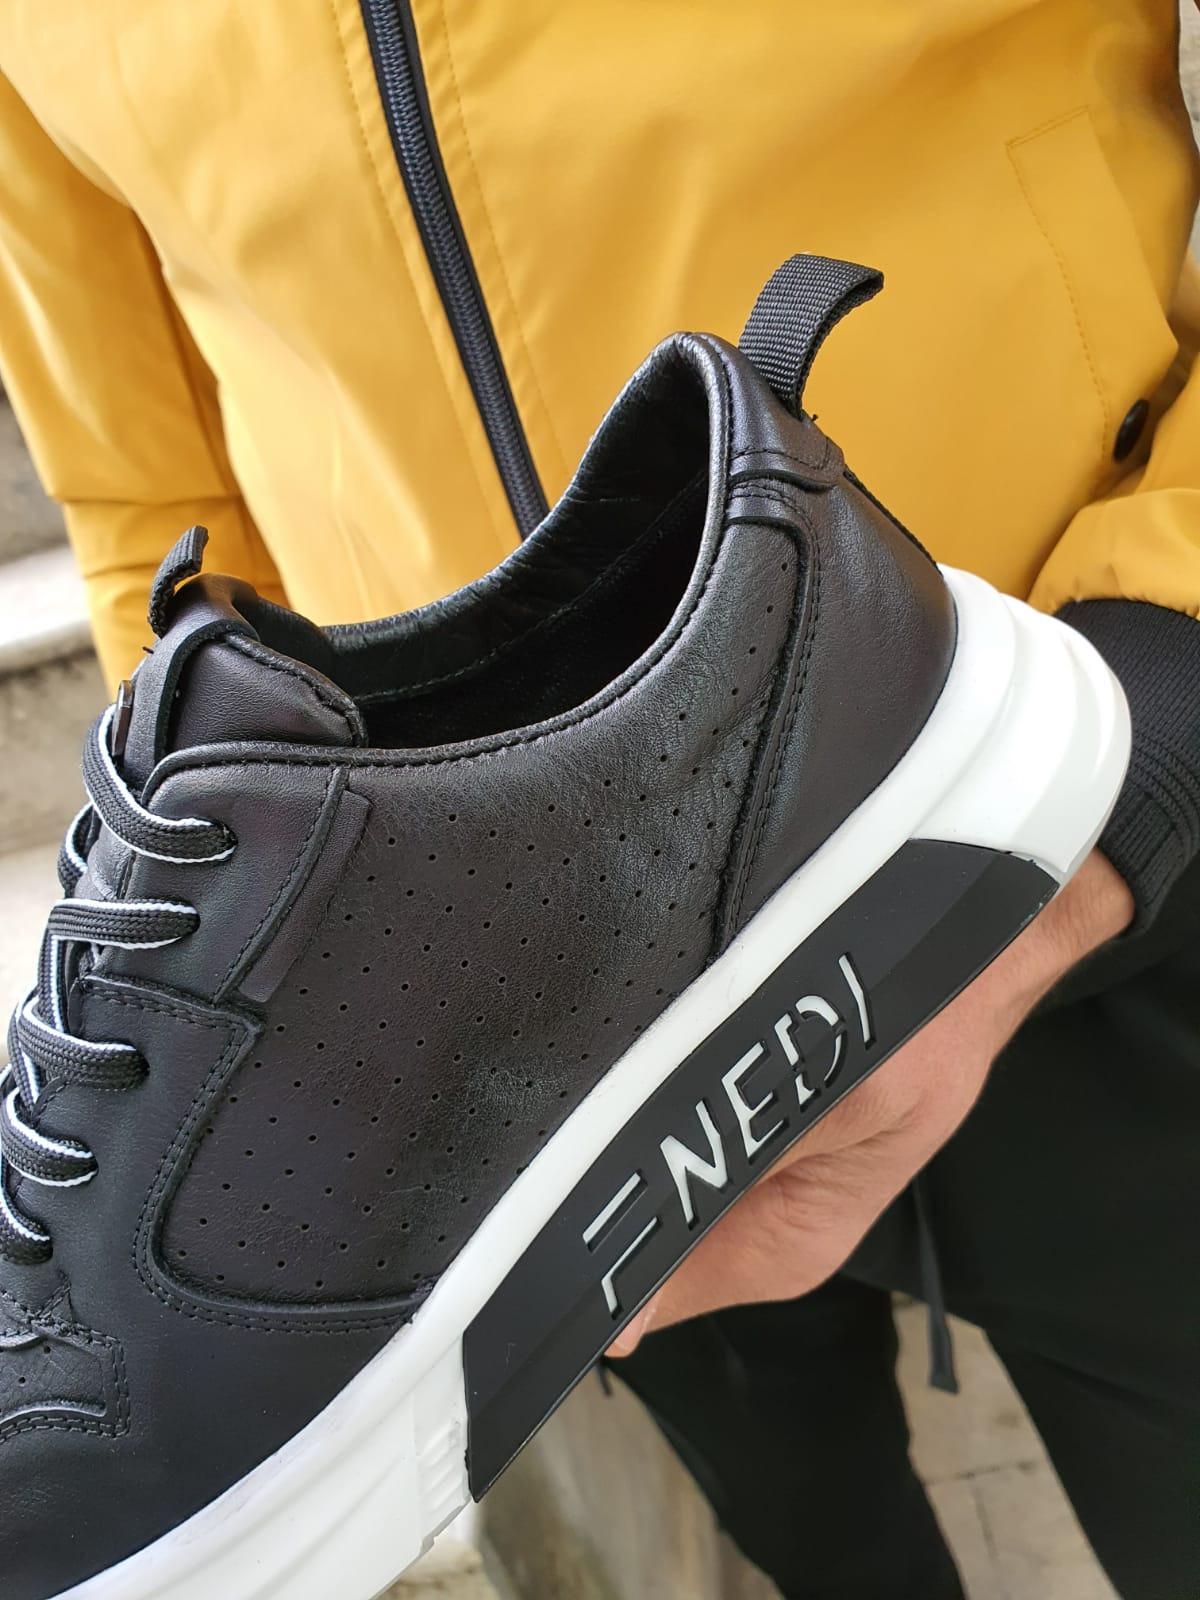 Black Mid Top Sneakers by Sardinelli